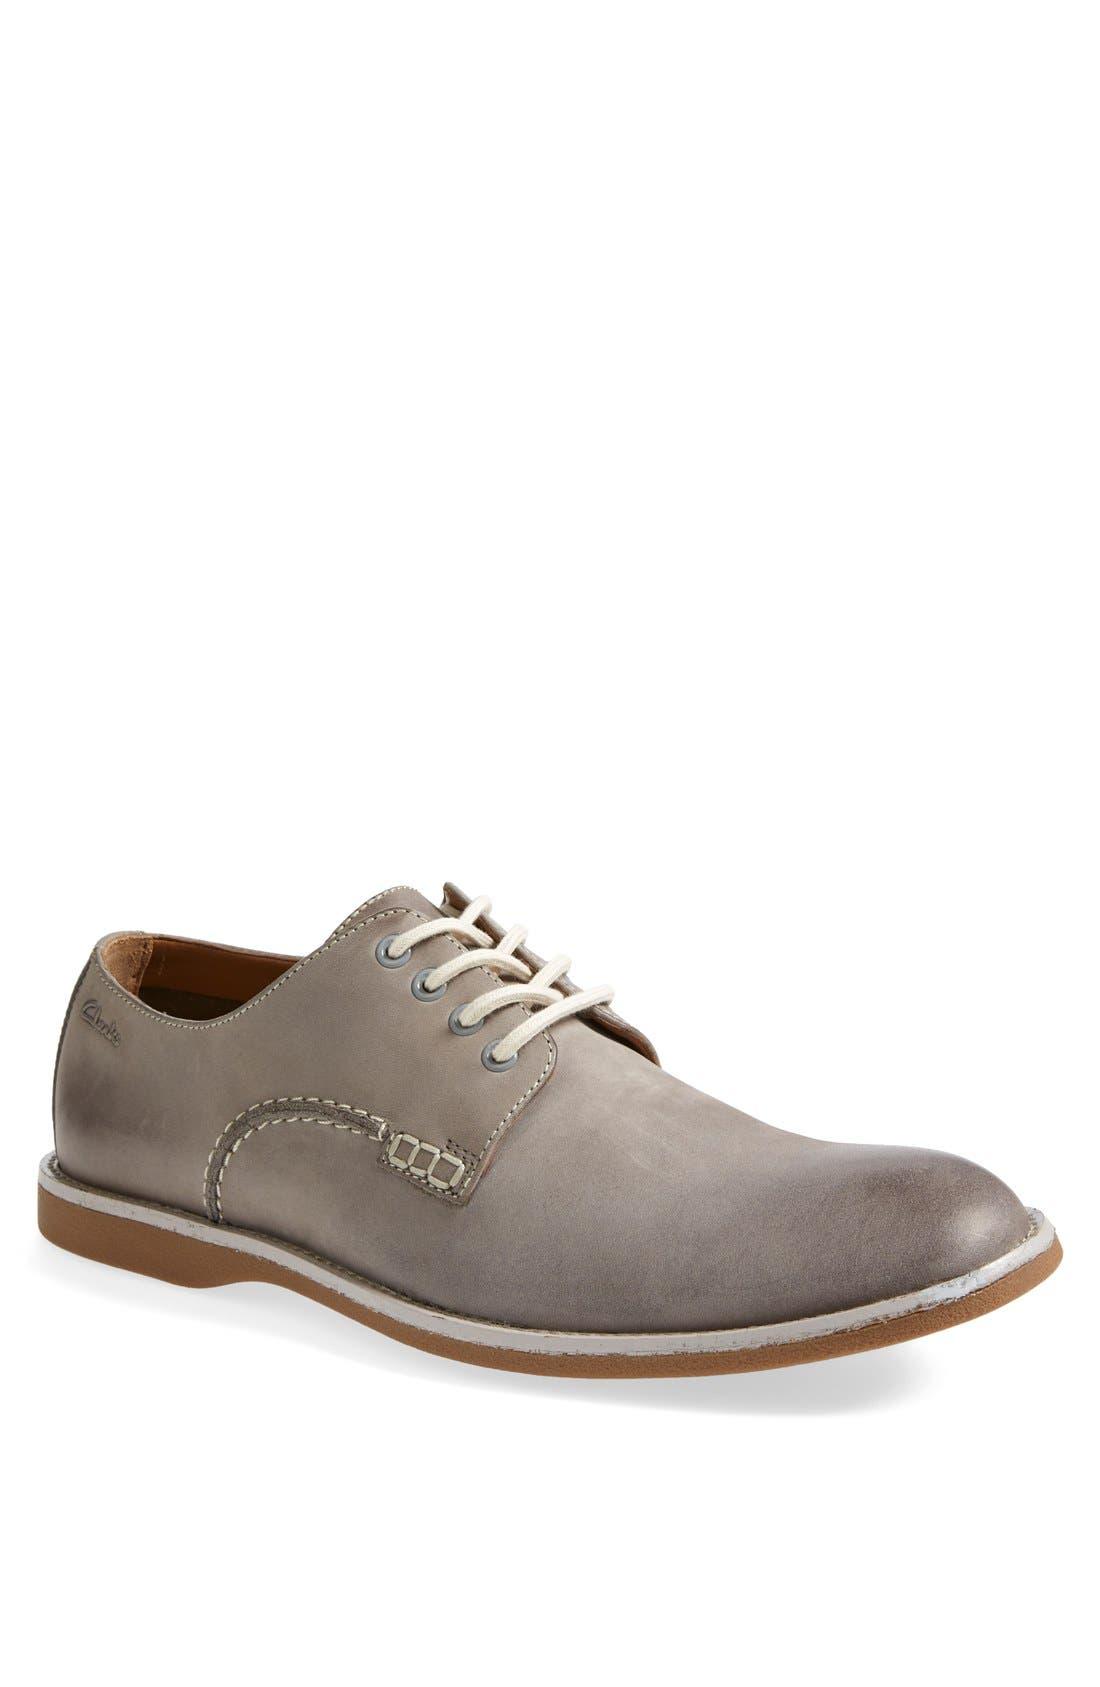 Main Image - Clarks® 'Farli Walk' Plain Toe Derby   (Men)